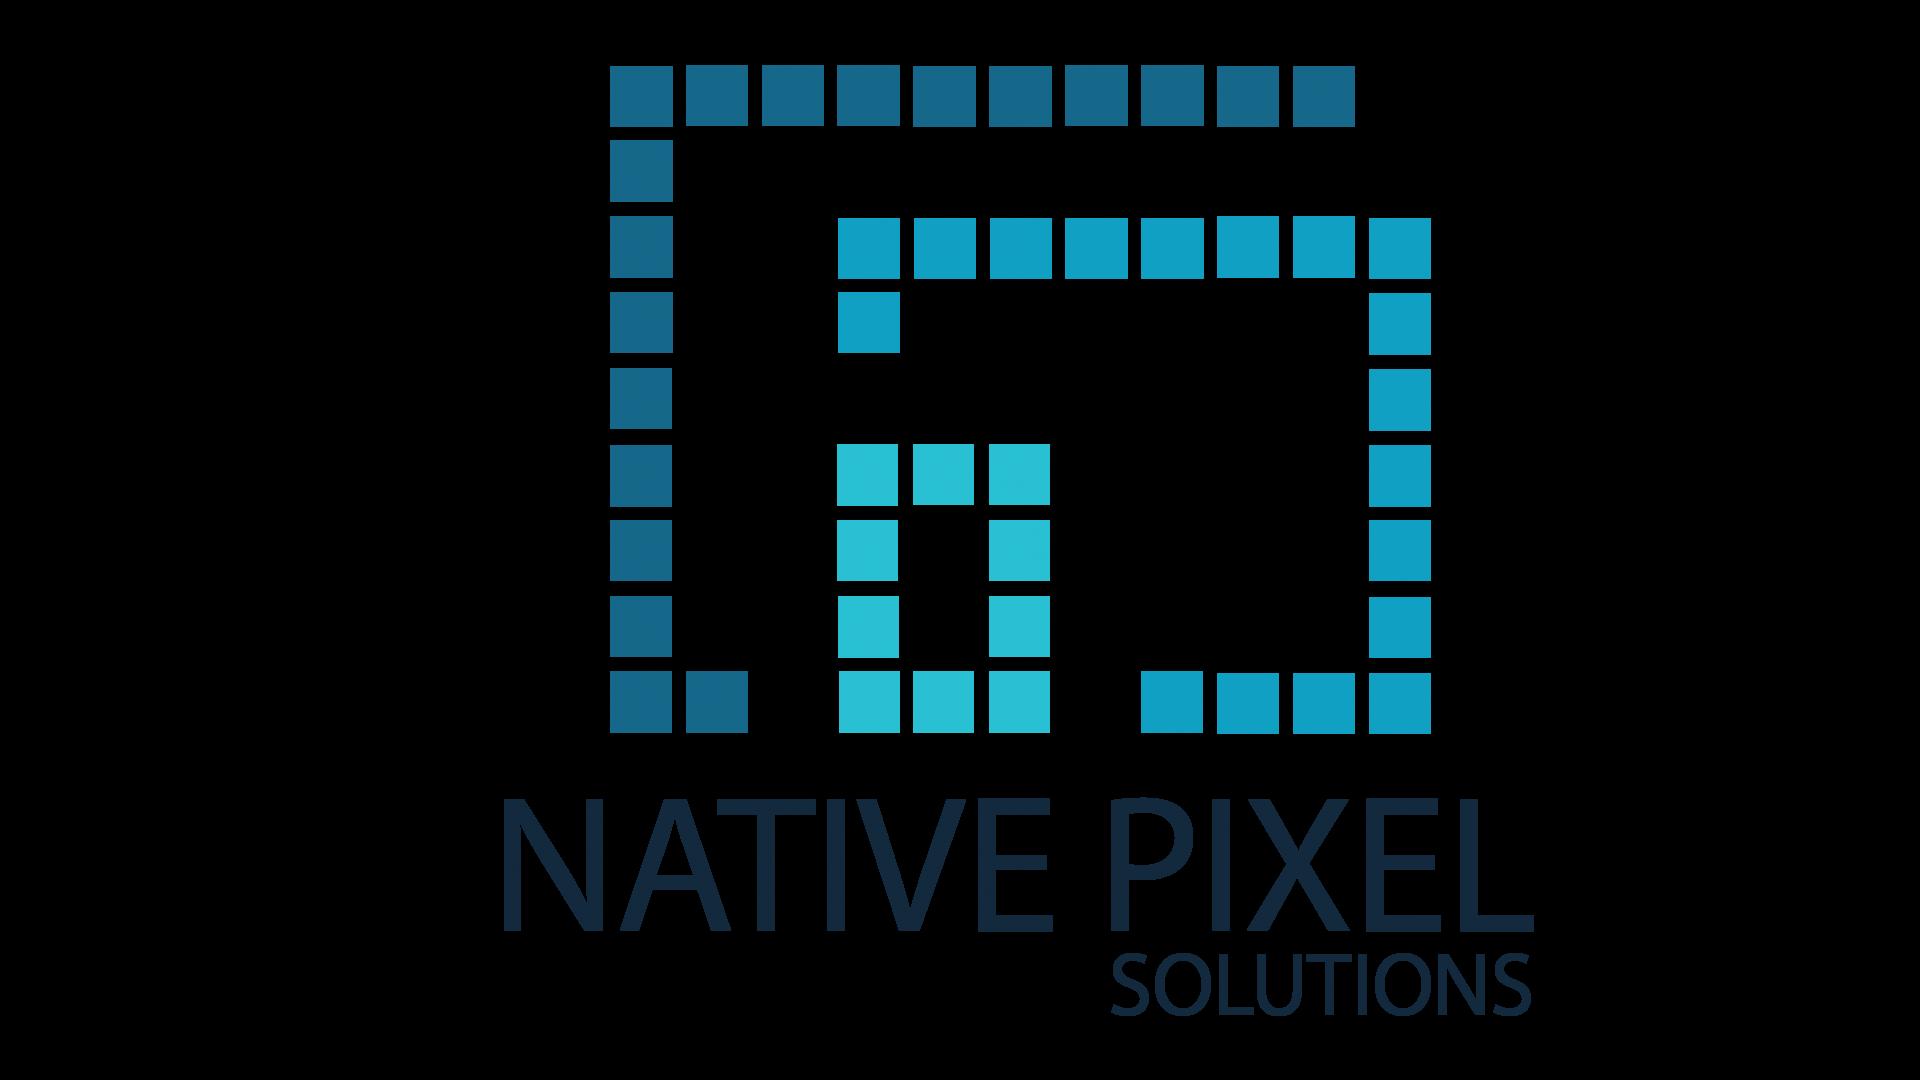 Native Pixel Solutions